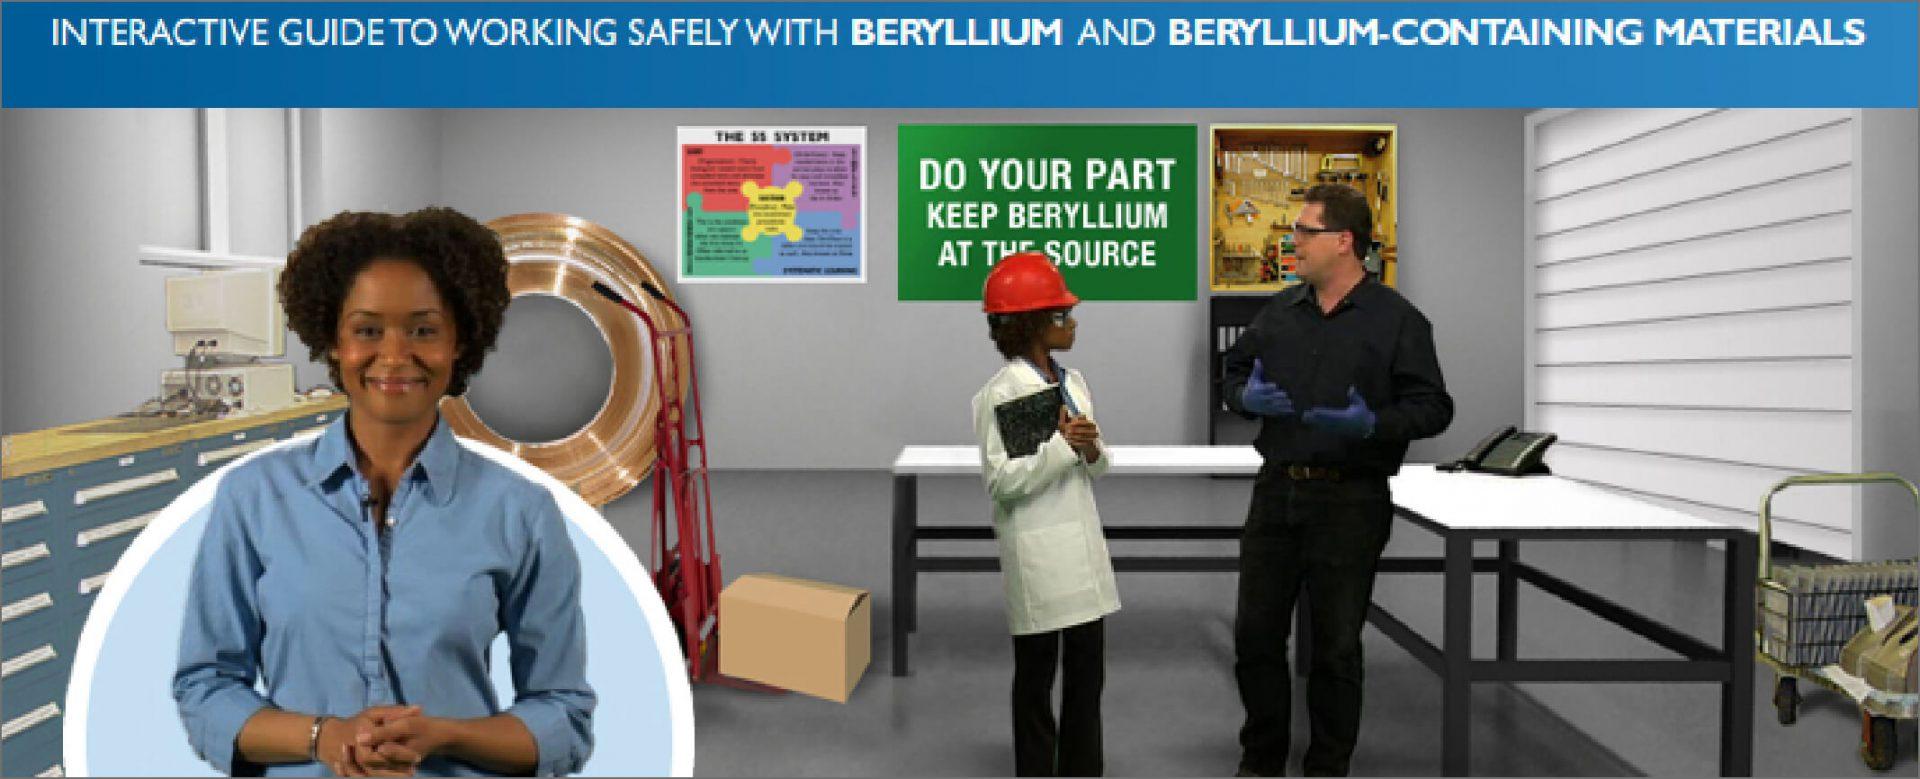 Beryllium Safety